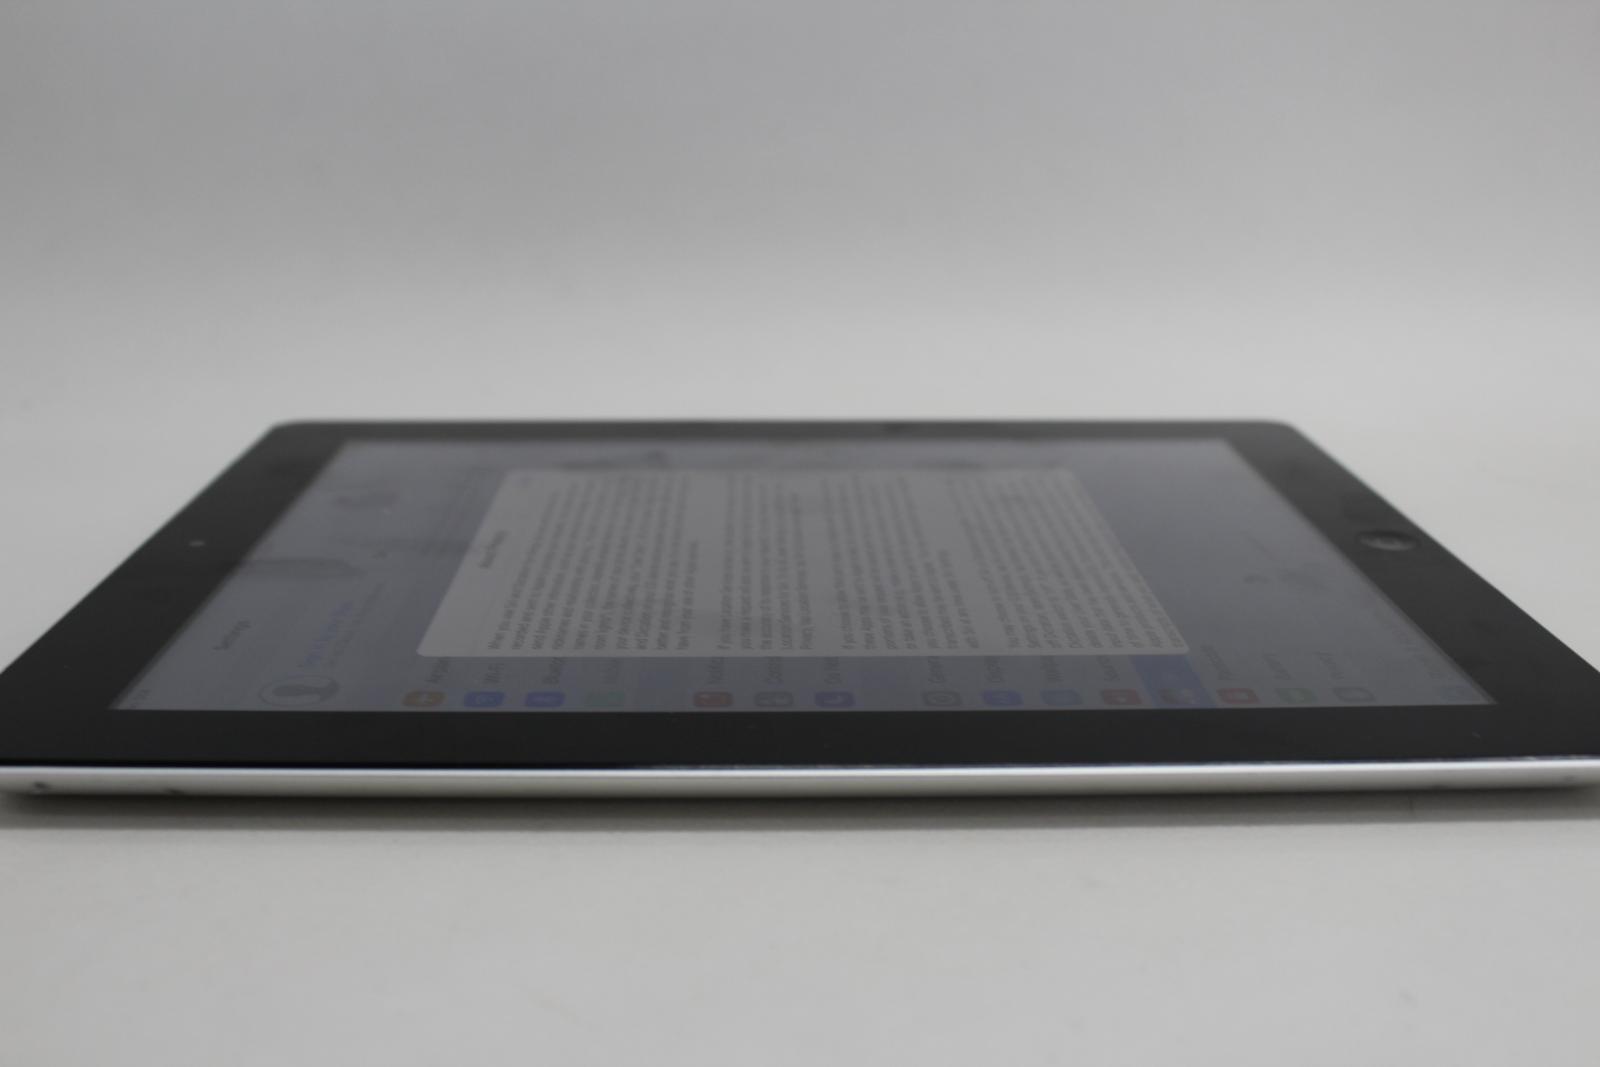 APPLE-iPad-4th-Gen-Tablet-9-7-inch-122-94GB-Black-Bezel-Wi-Fi-Model-A1460 thumbnail 7